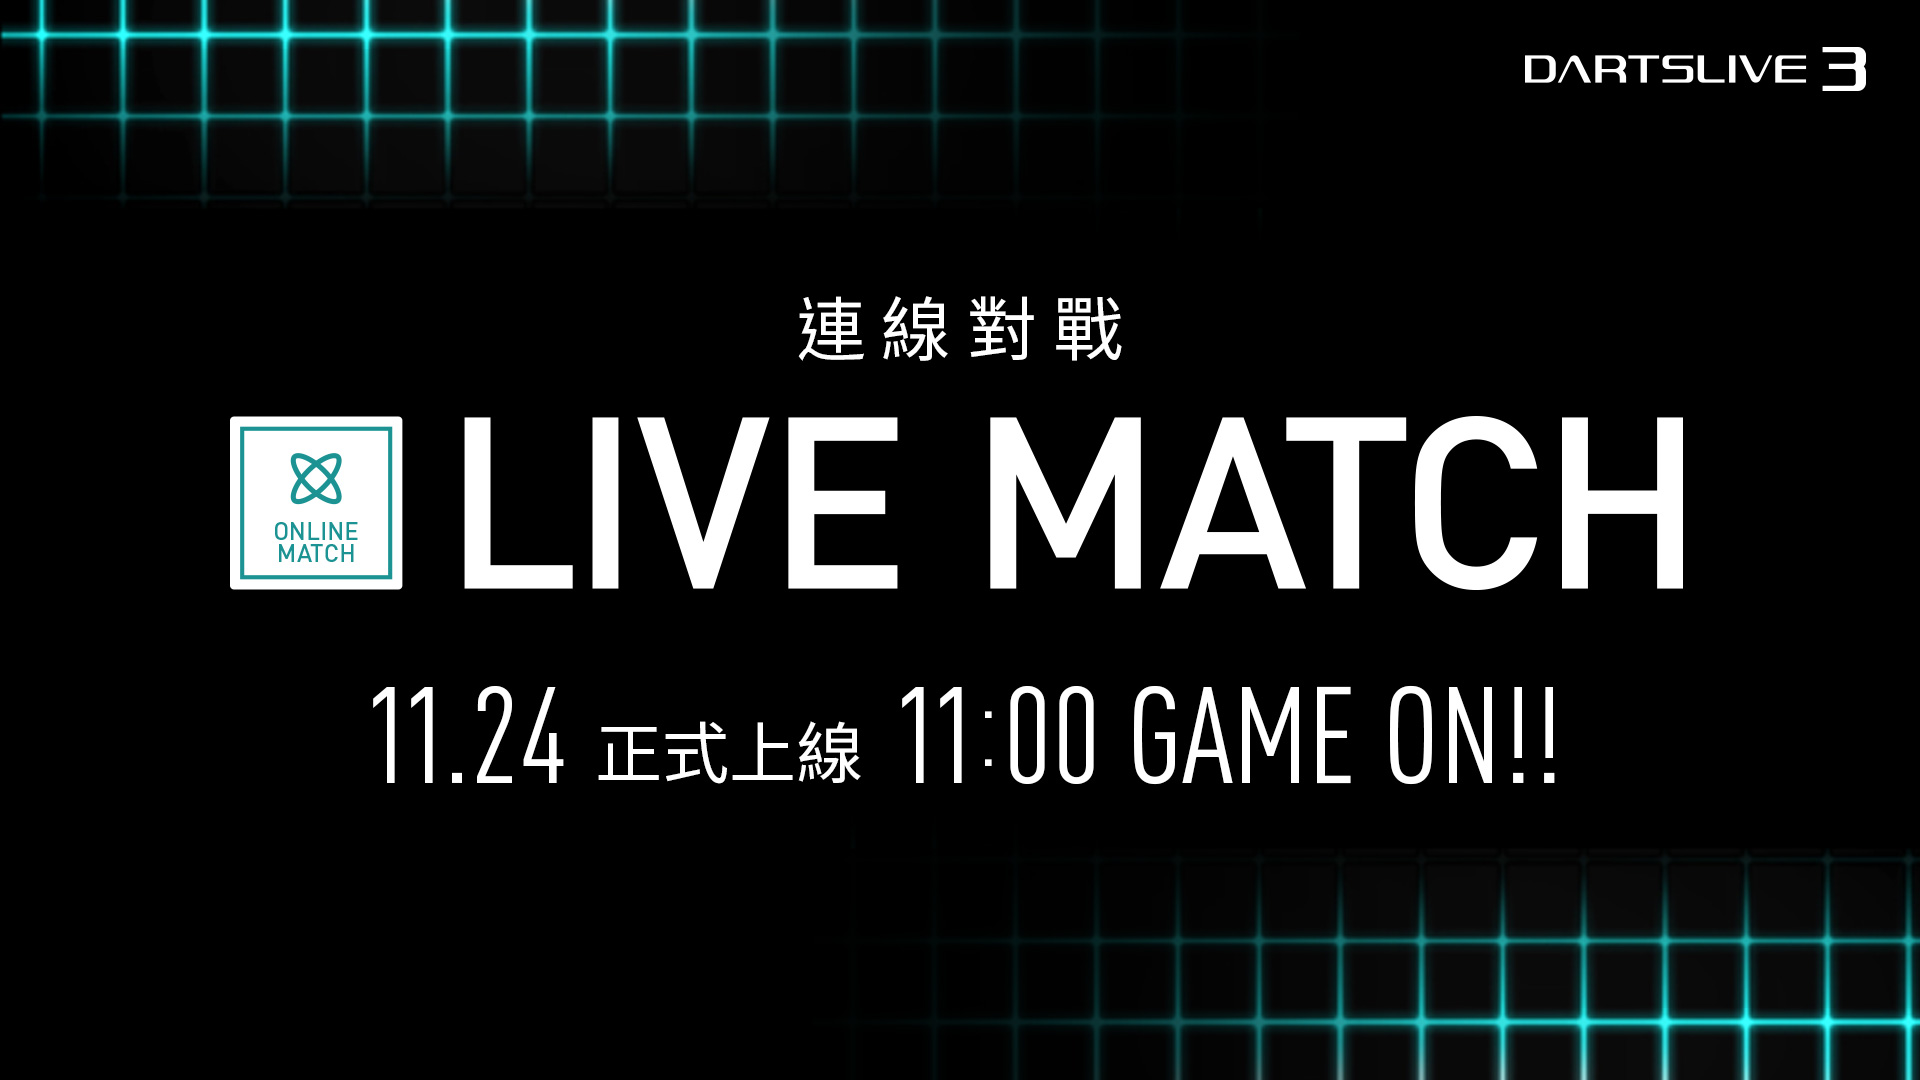 DARTSLIVE3「LIVE MATCH」於11月24日(週二)正式上線!